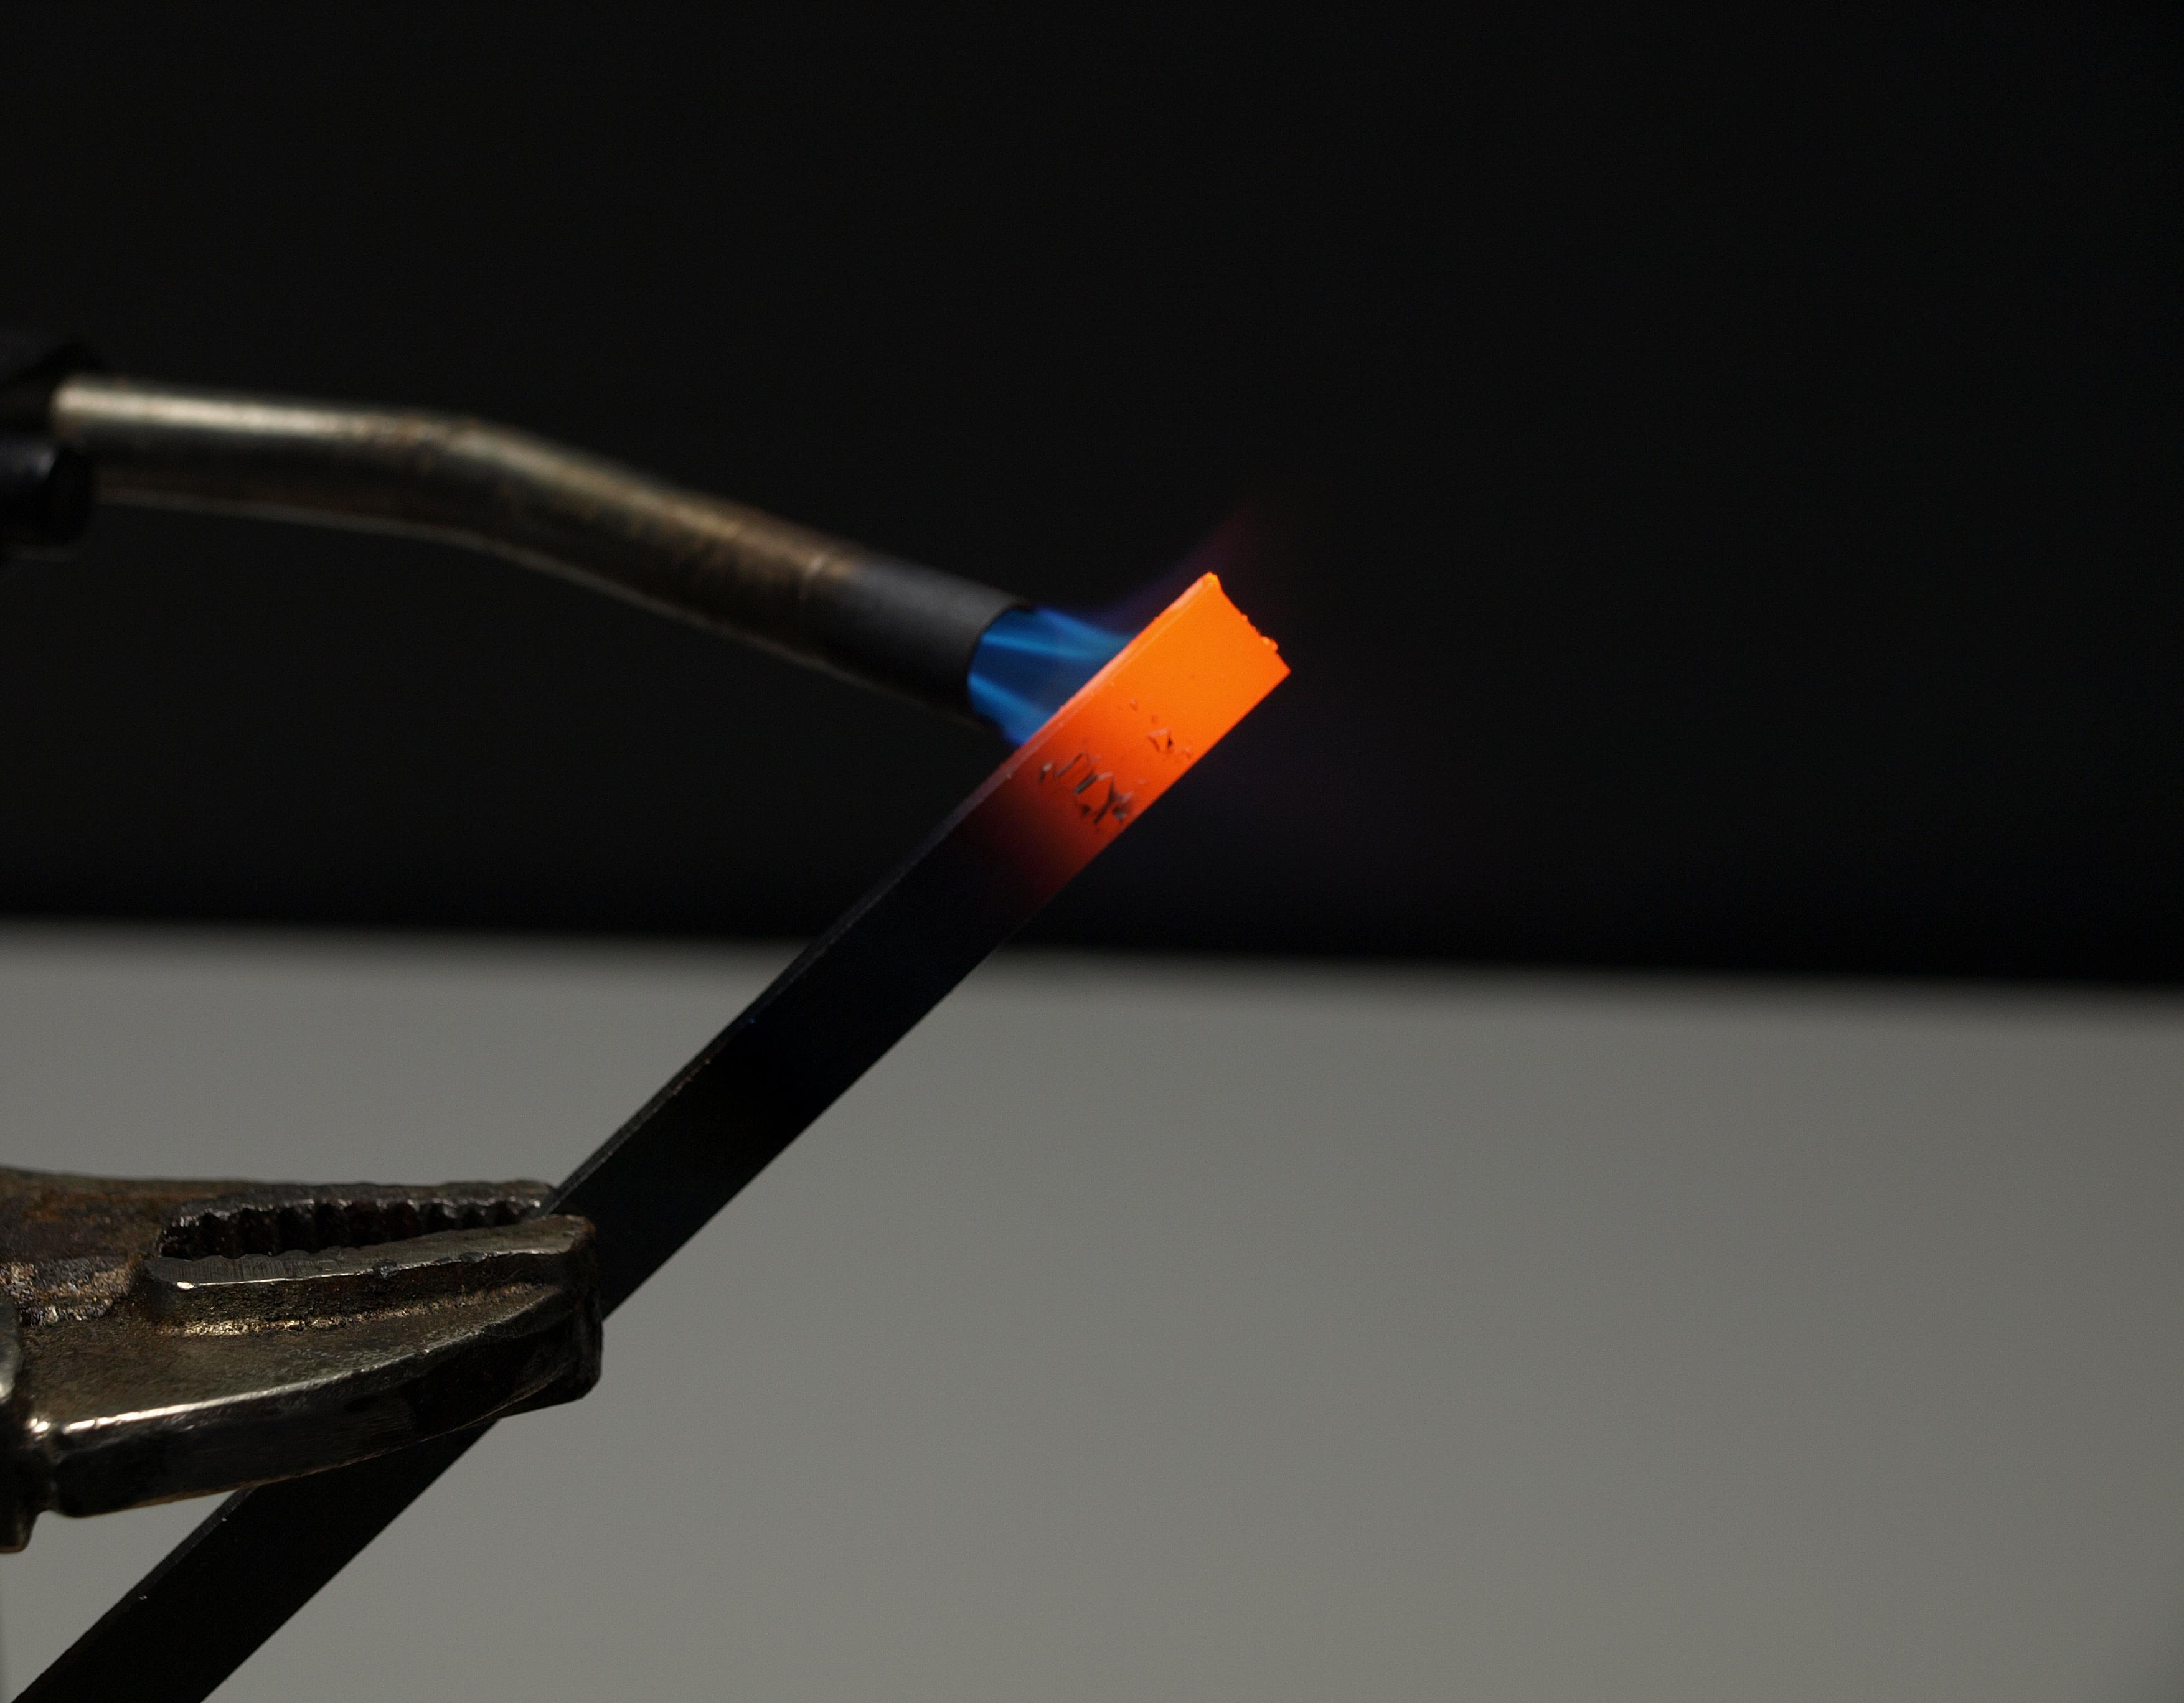 Diy Heat Treatment Of Tool Steel The Sharpening Blog